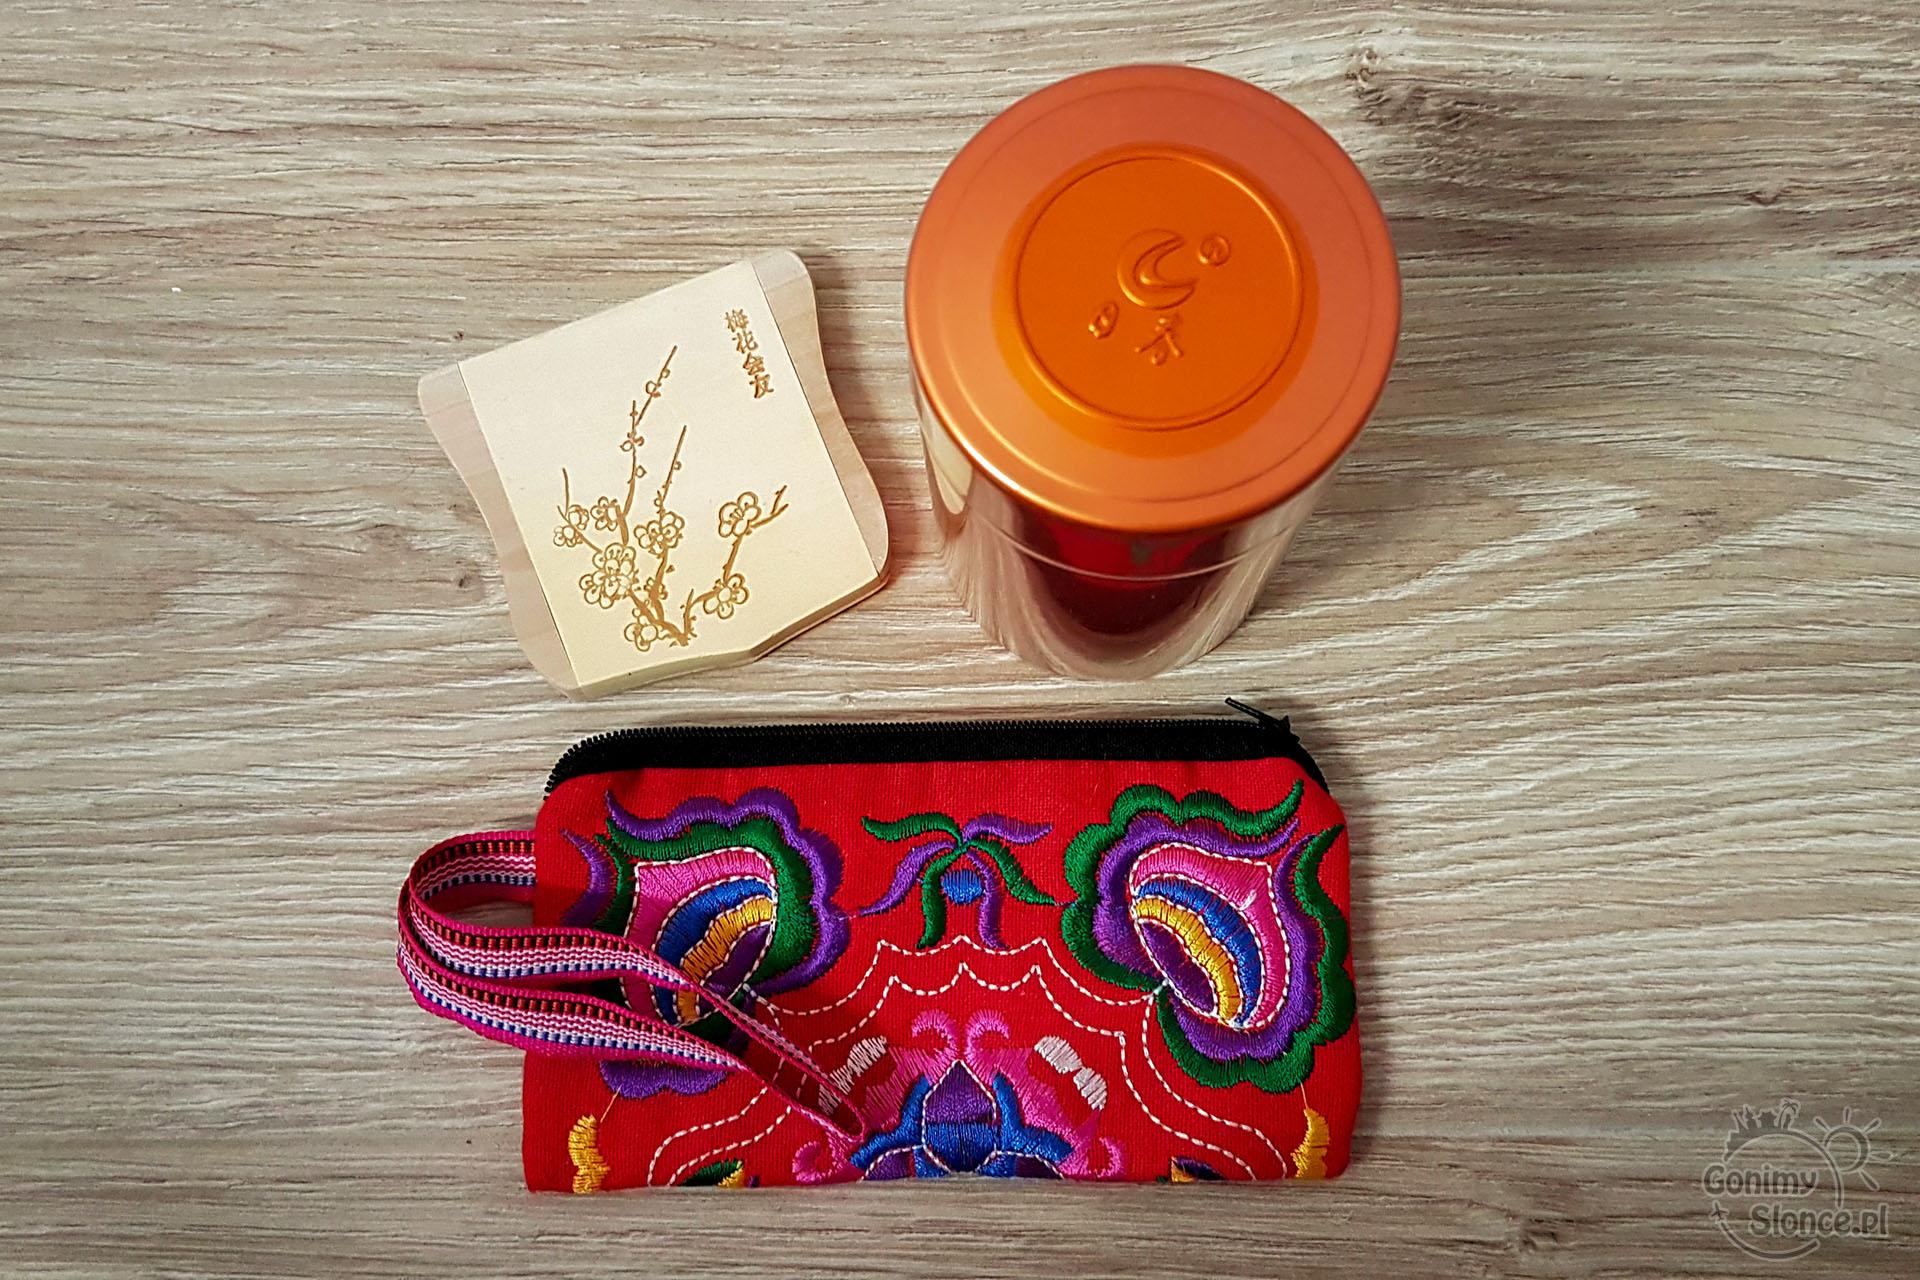 Paczka z Chin - bonus dla WOŚP - herbata, porfelik i lusterko